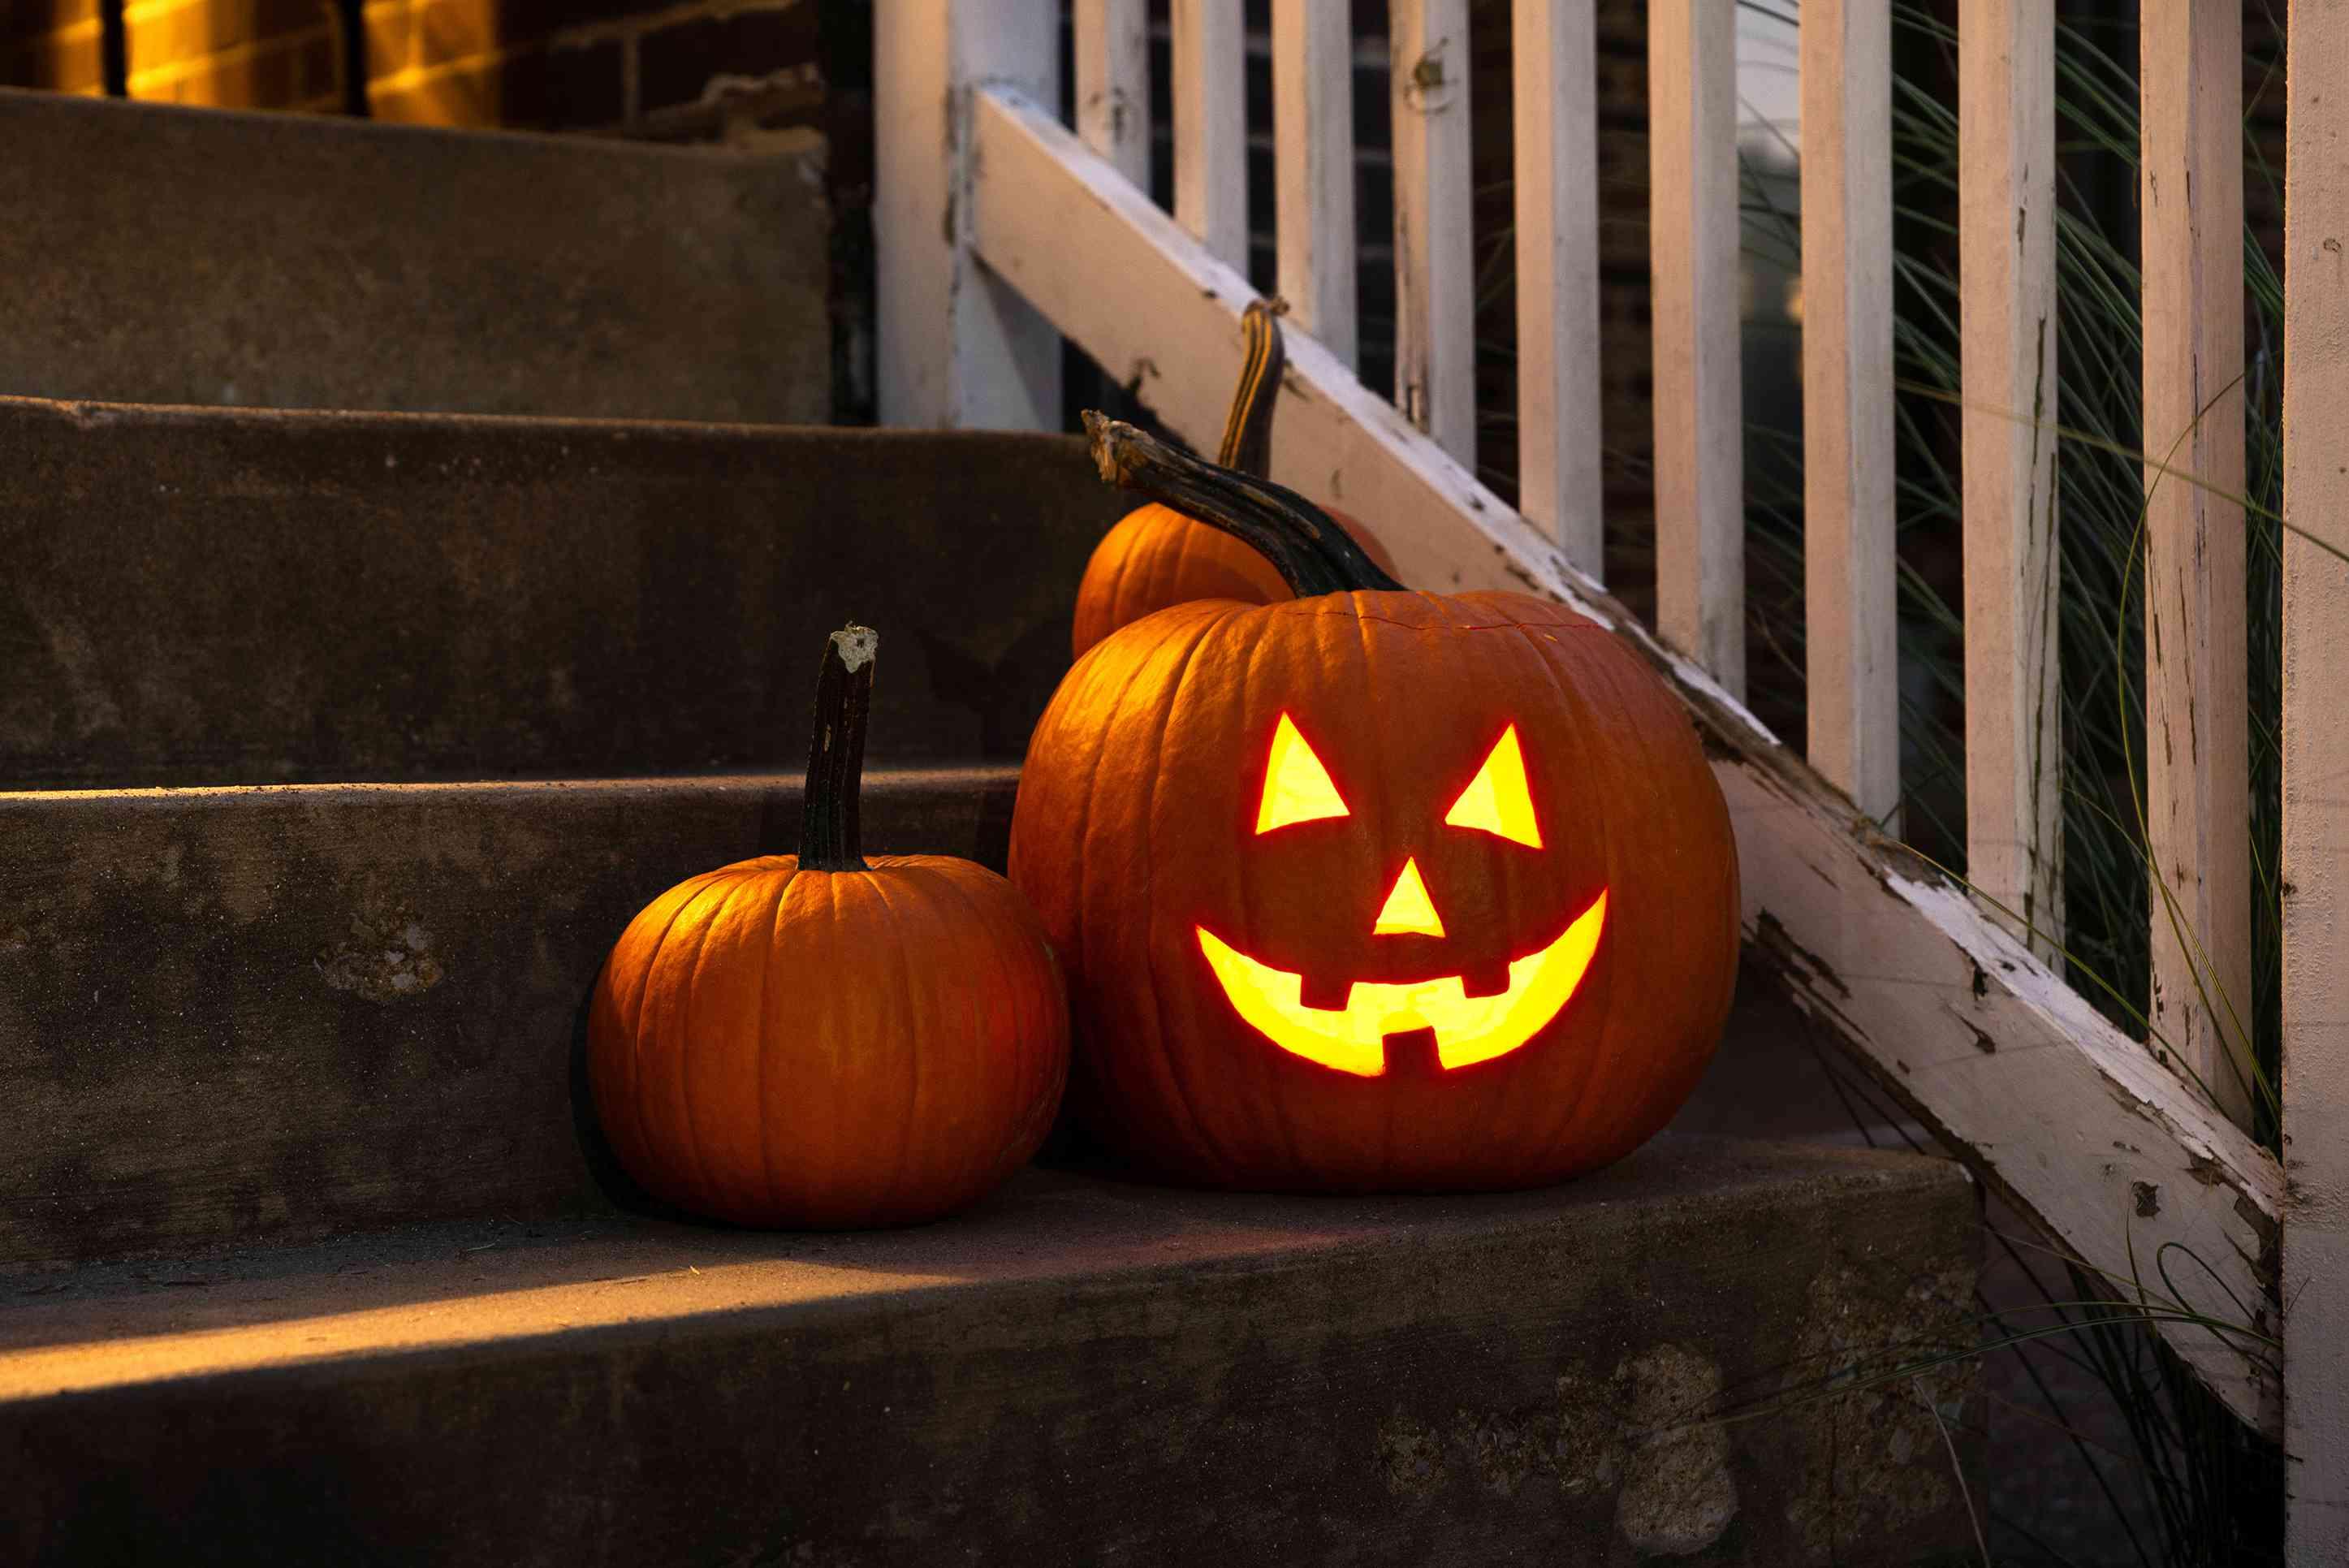 spooky glowing pumpkin at night